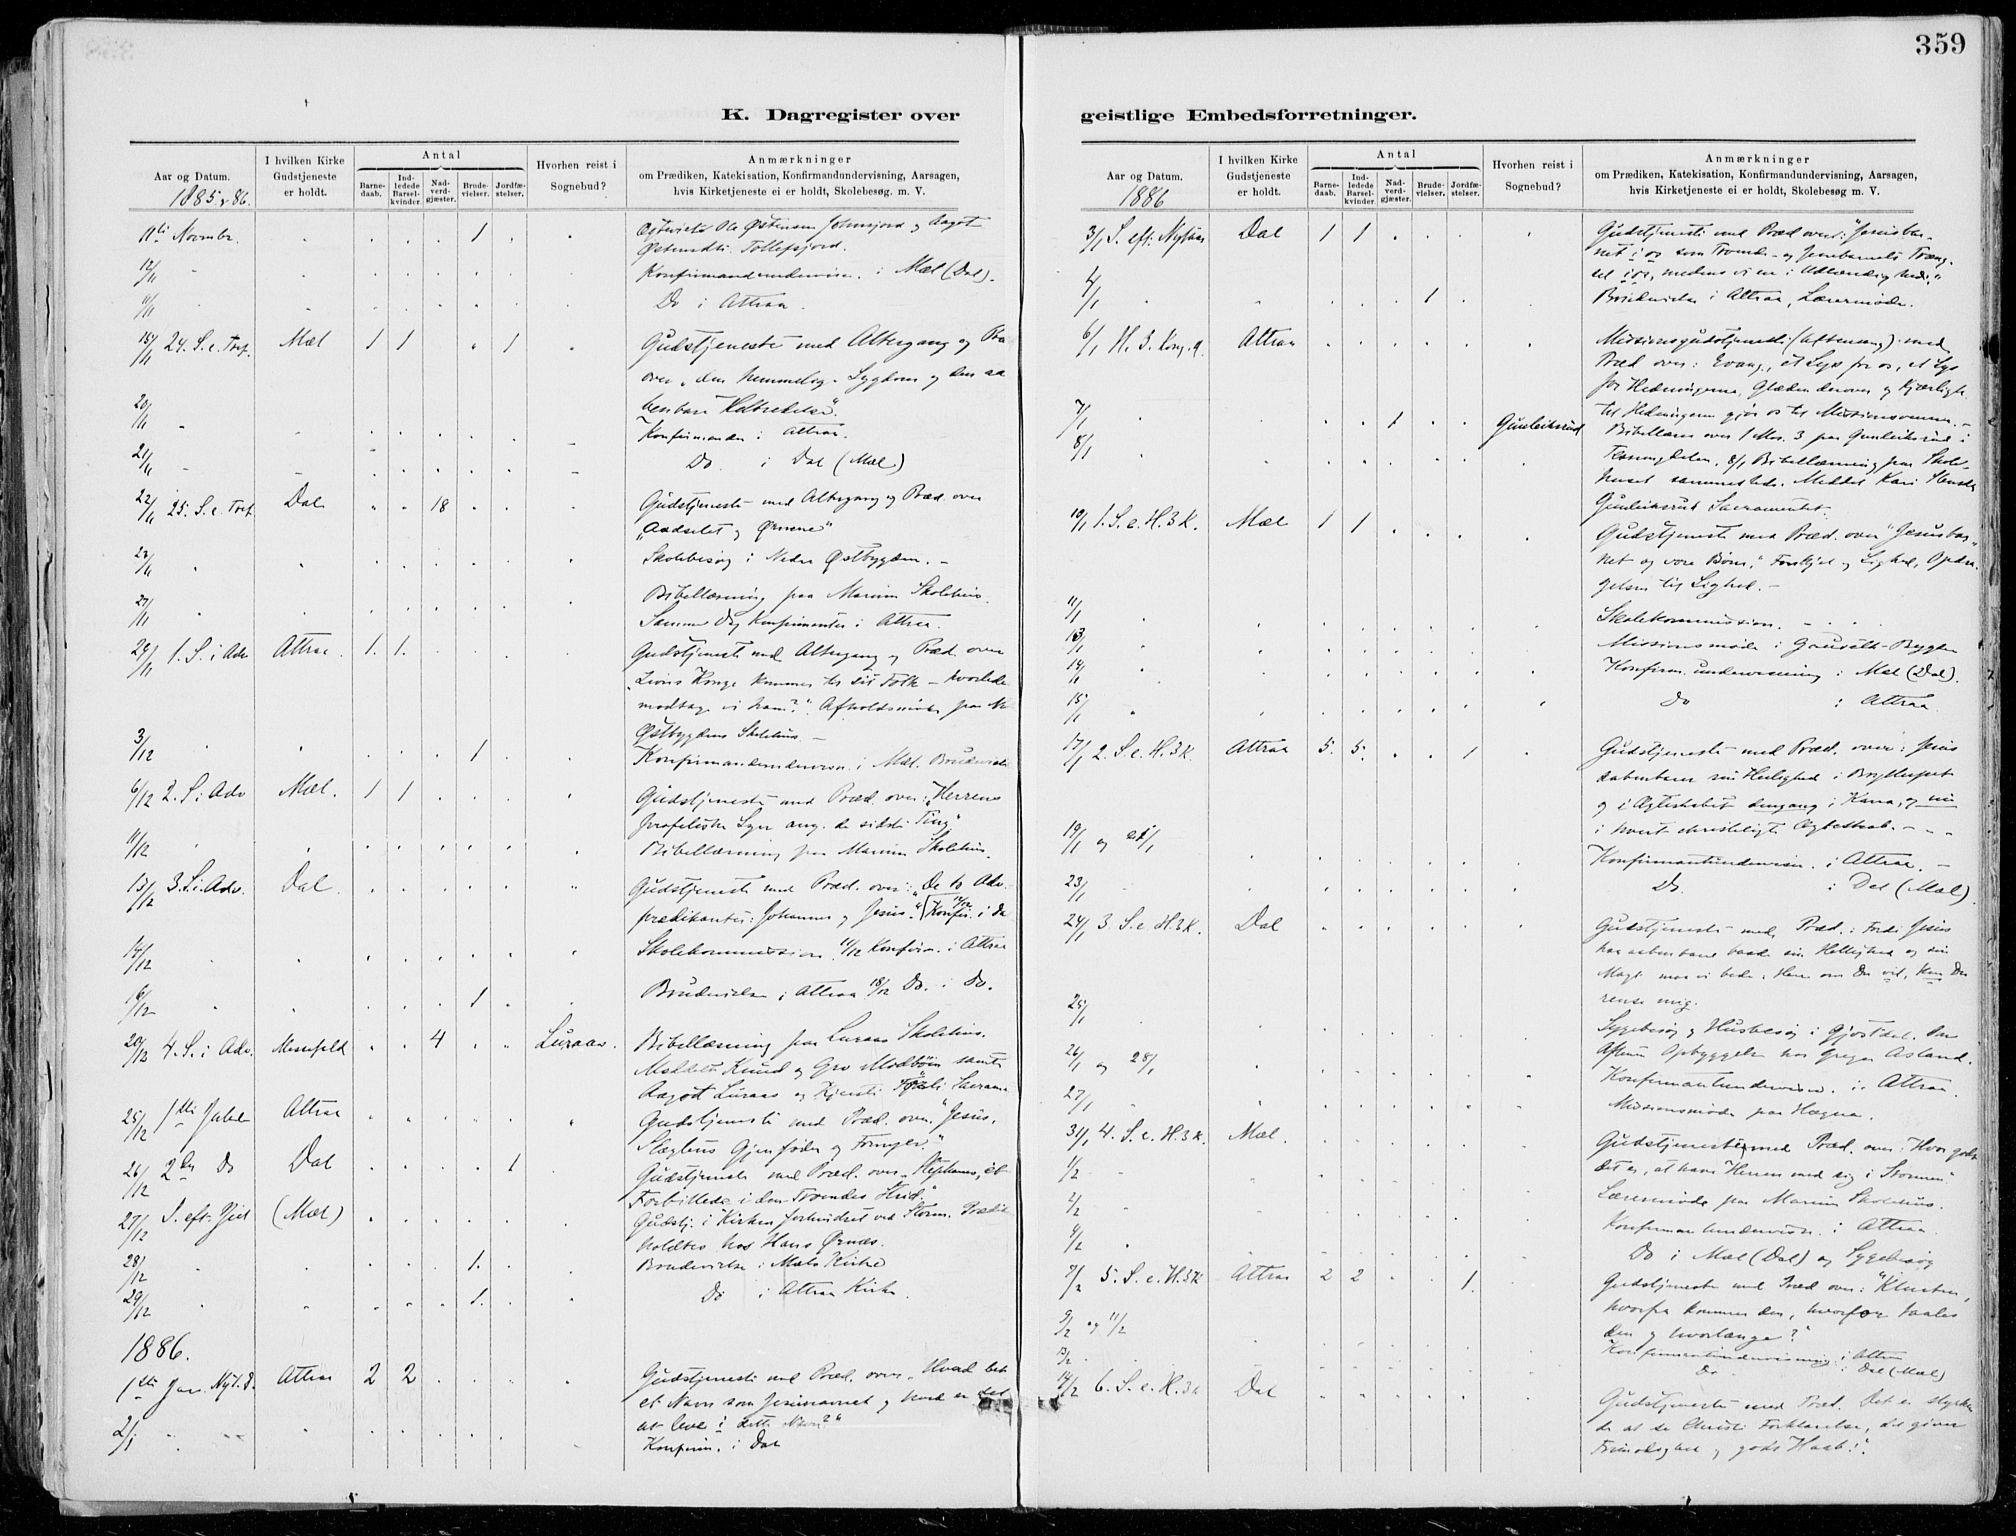 SAKO, Tinn kirkebøker, F/Fa/L0007: Ministerialbok nr. I 7, 1878-1922, s. 359